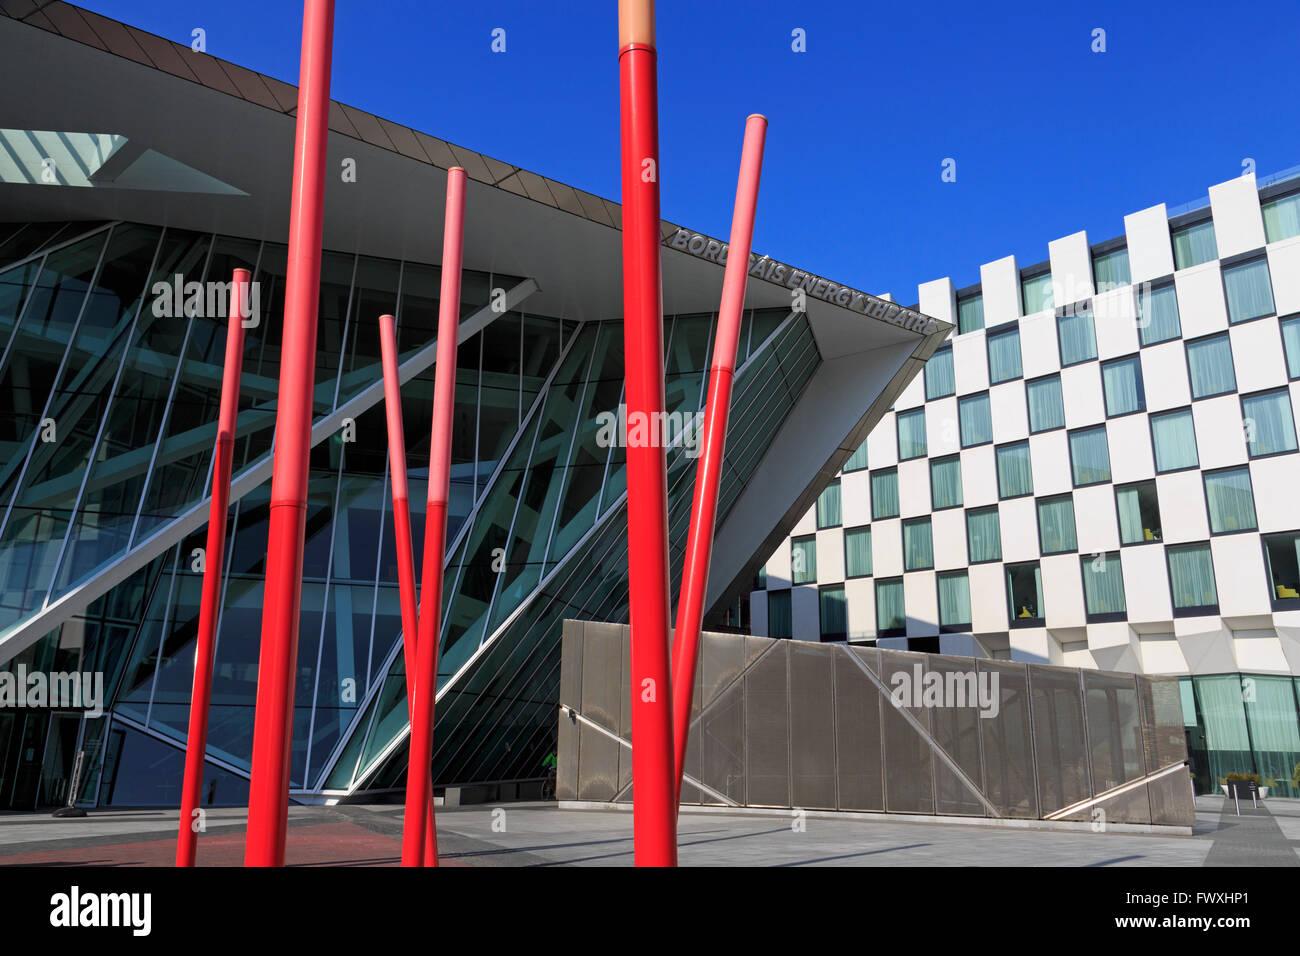 Bord Gais Energy Theatre, Grand Canal Dock, Dublin City, County Dublin, Ireland, Europe - Stock Image